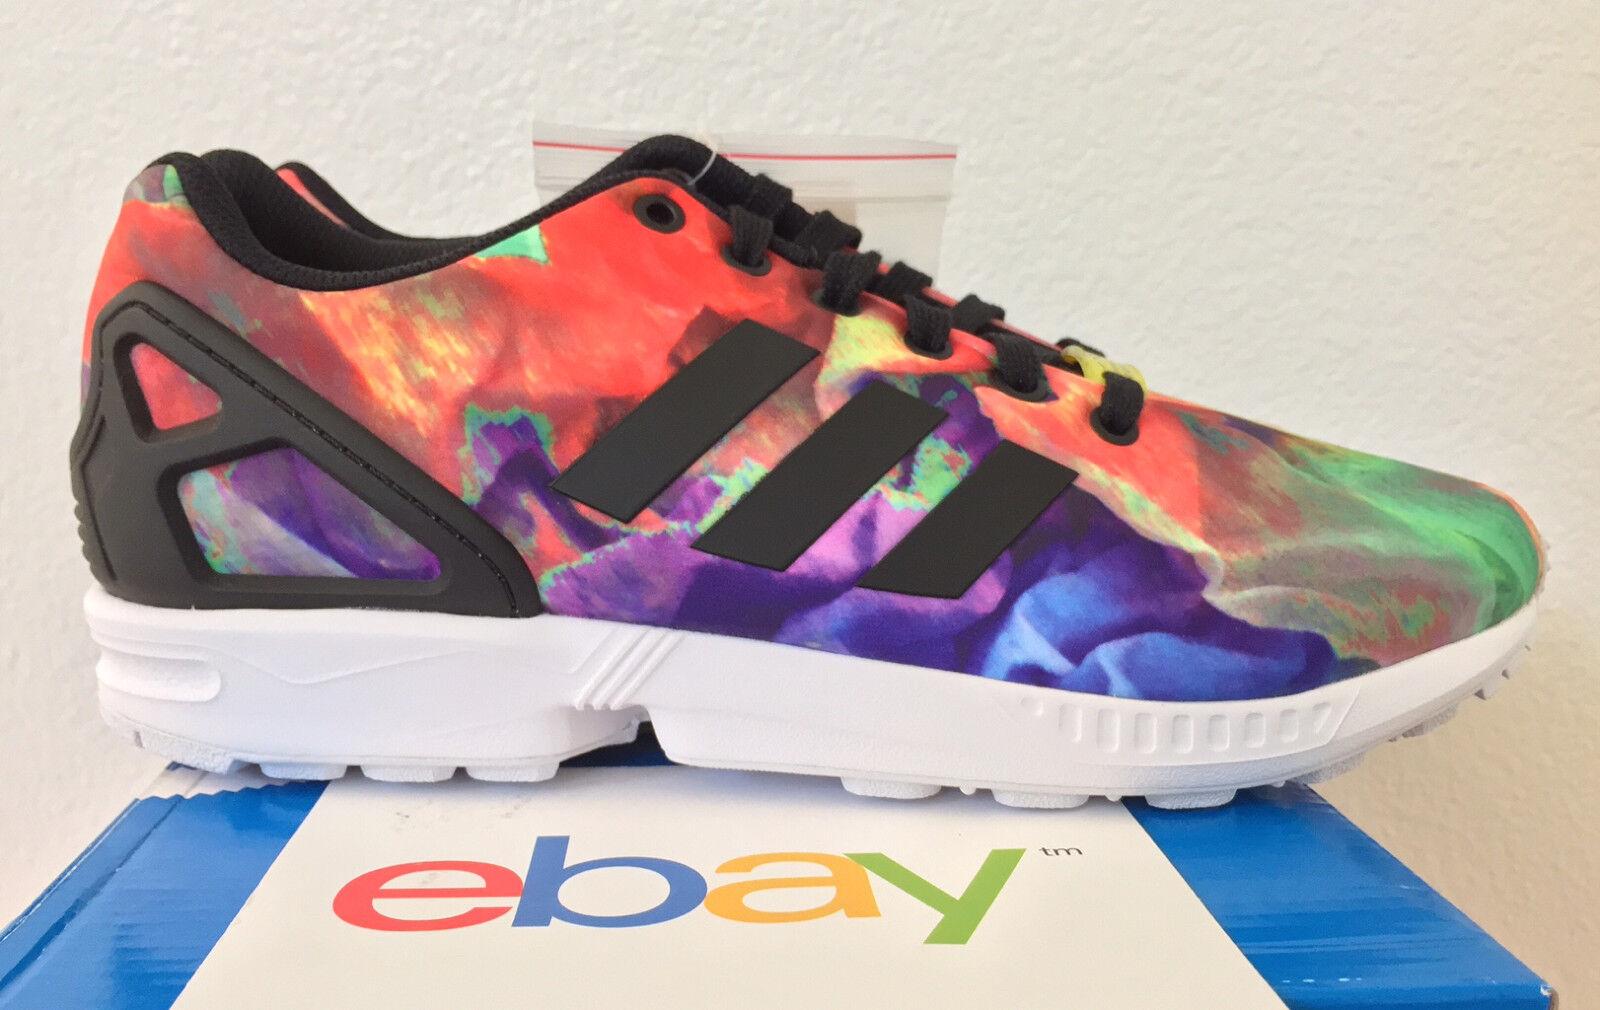 c448cb30e0da Women s adidas ZX Flux Running Athletic Shoes Tropical Melon M21364 ...